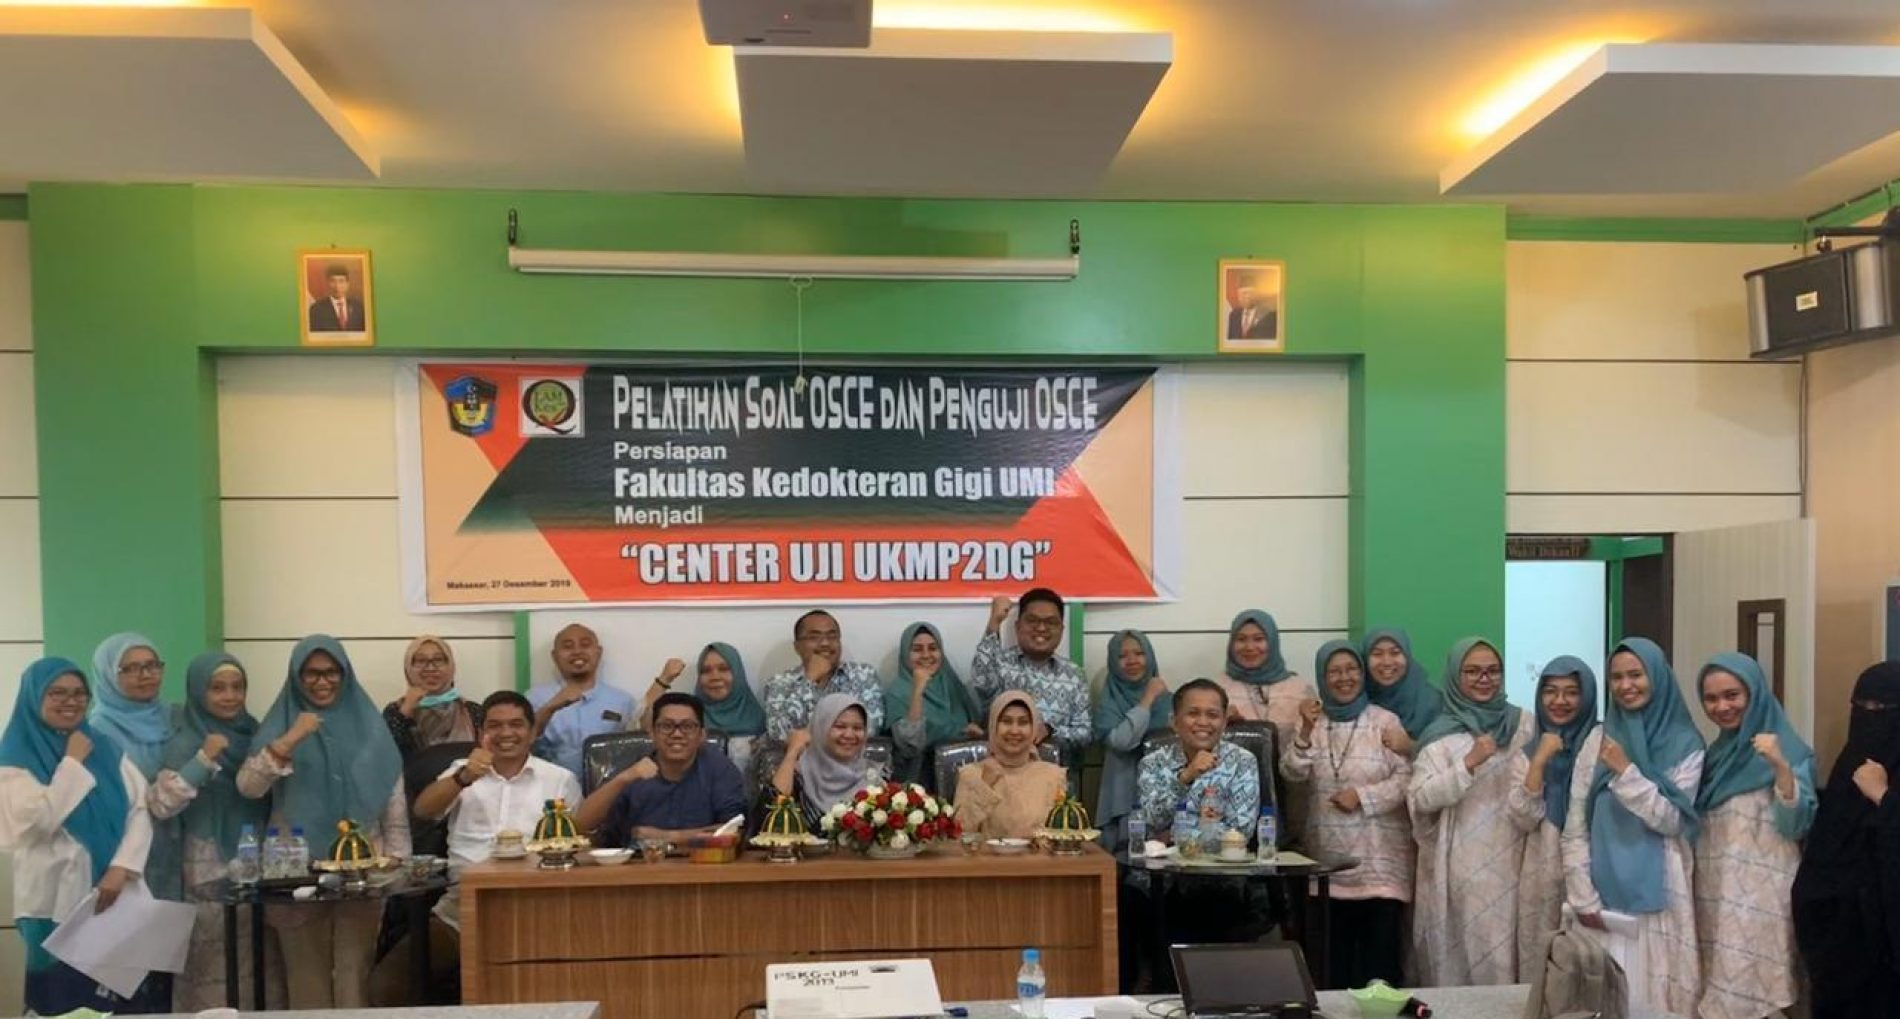 VISITASI CENTER UJI KOMPETENSI DOKTER GIGI DAN PELATIHAN PENGUJI OSCE DOSEN FAKULTAS KEDOKTERAN GIGI UNIVERSITAS MUSLIM INDONESIA